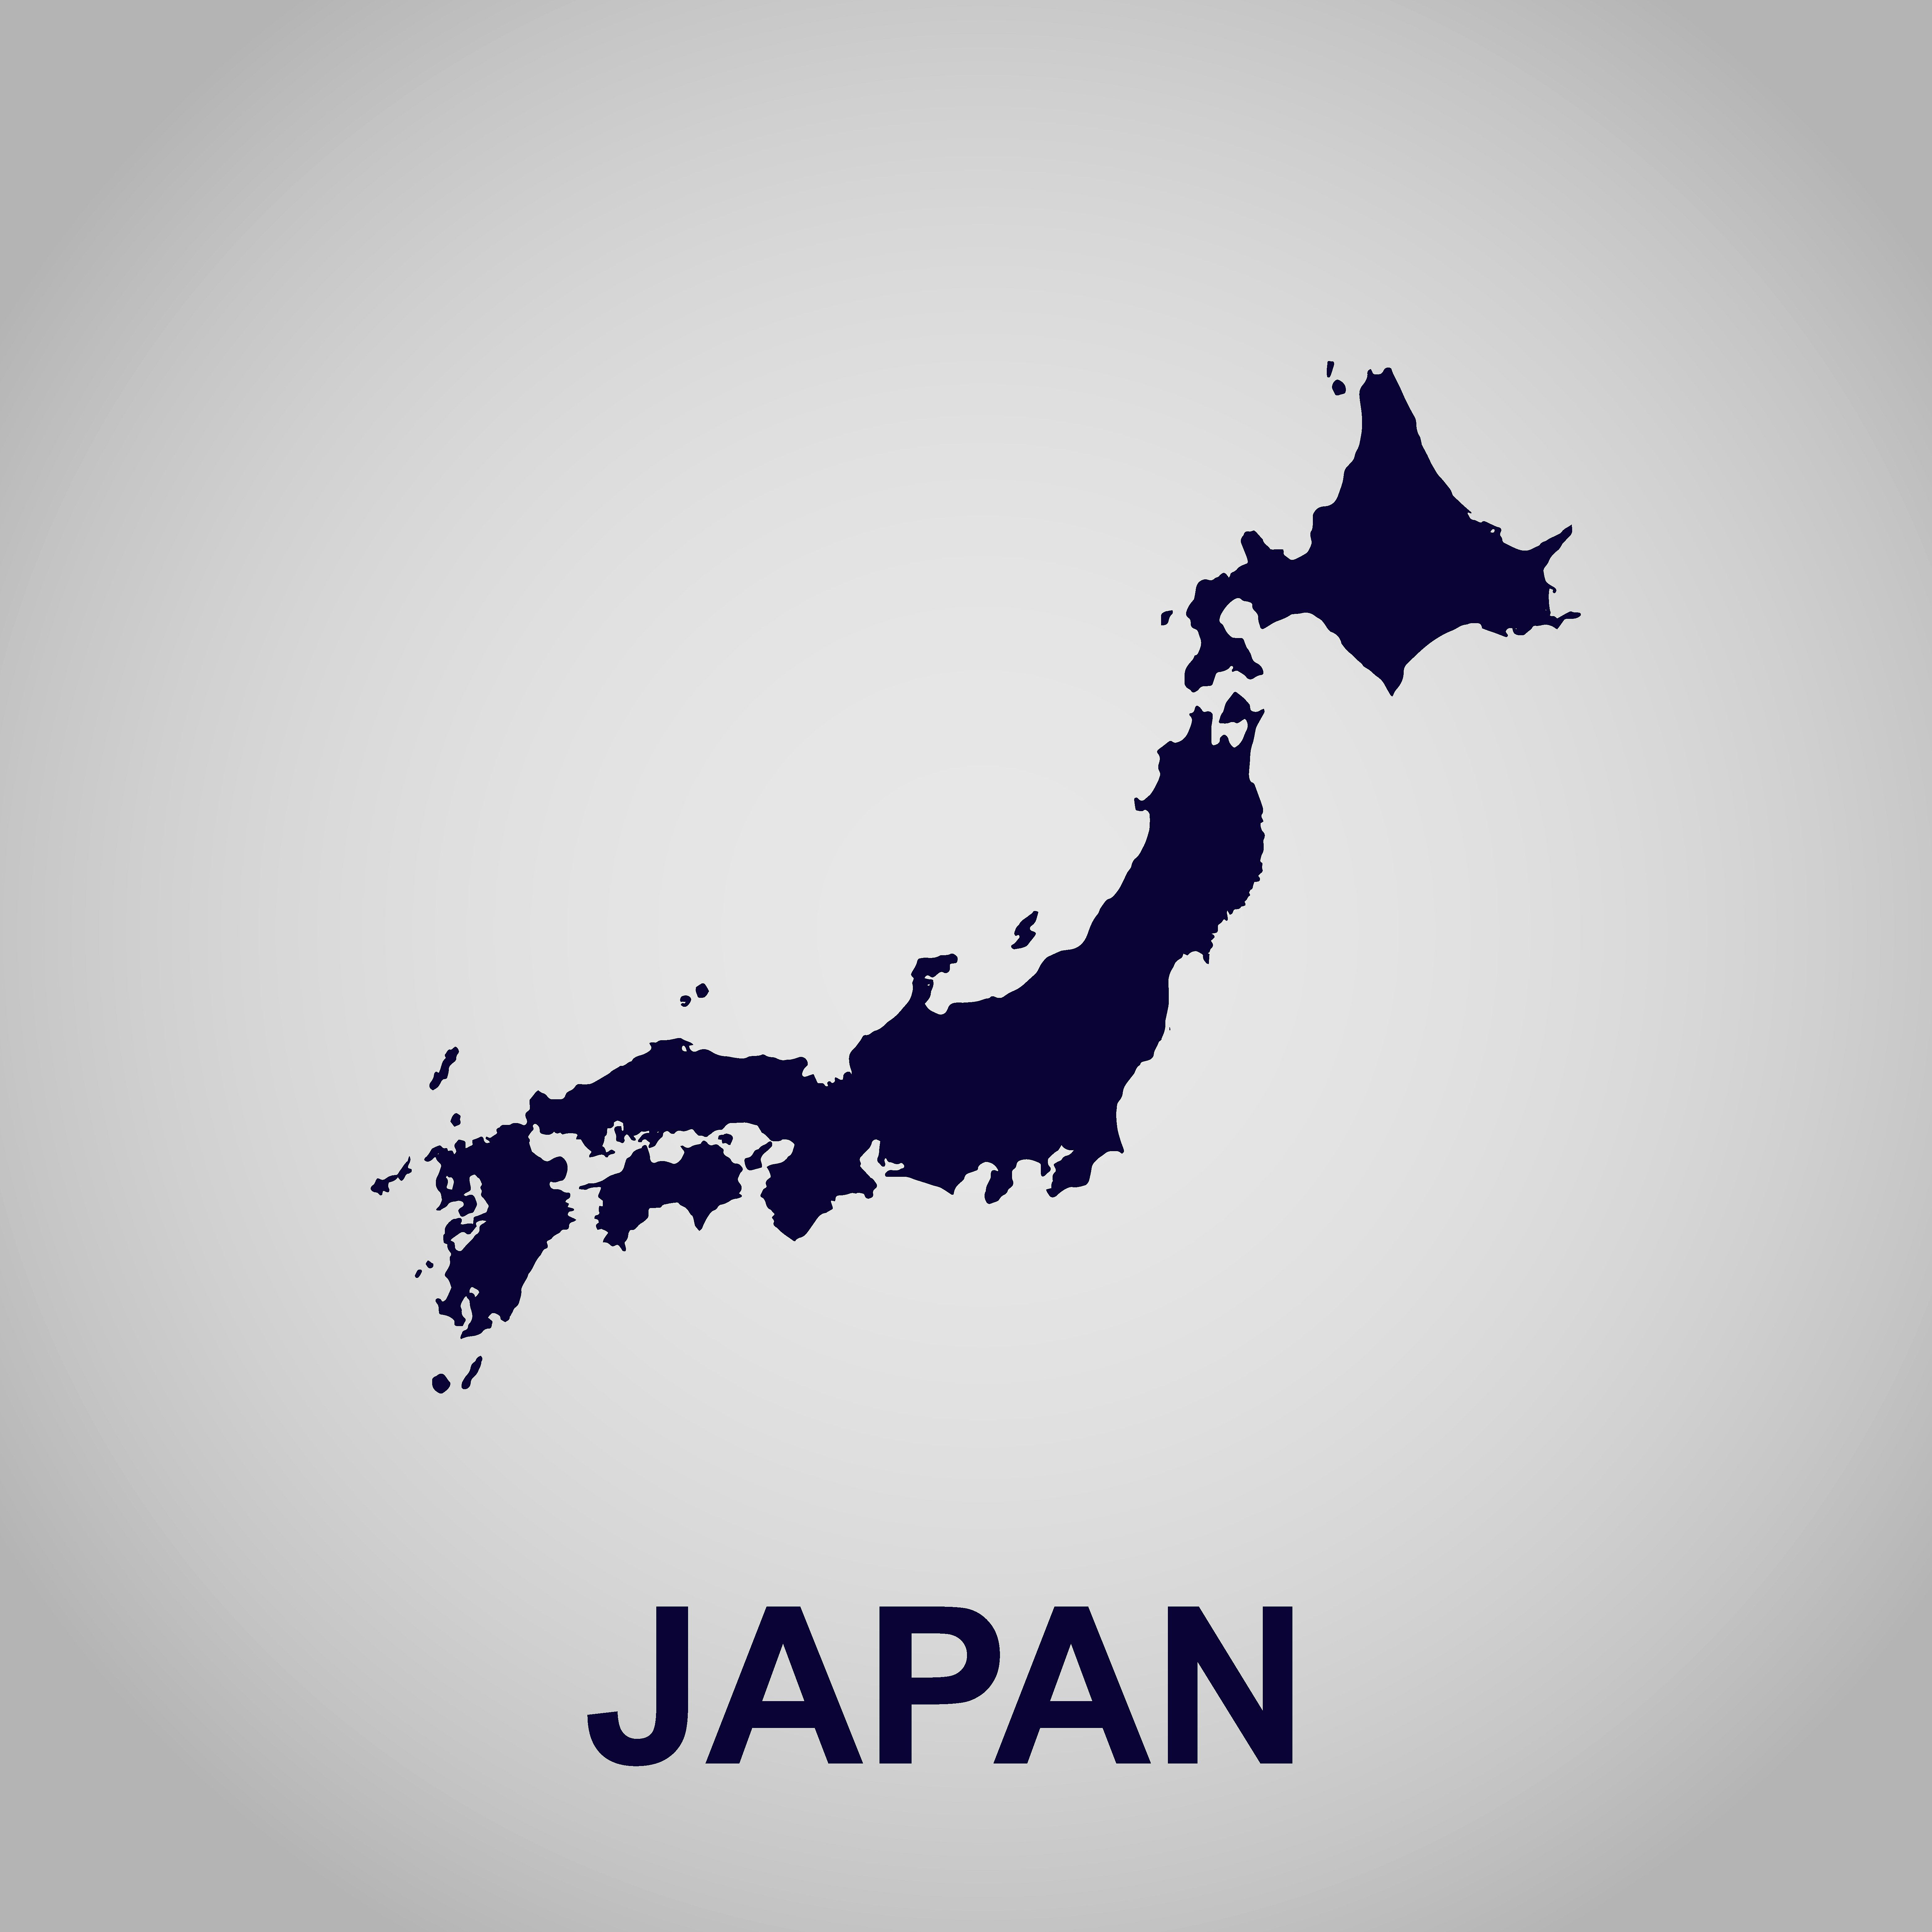 Map Of Japan Japan Map Japan Painting Japan